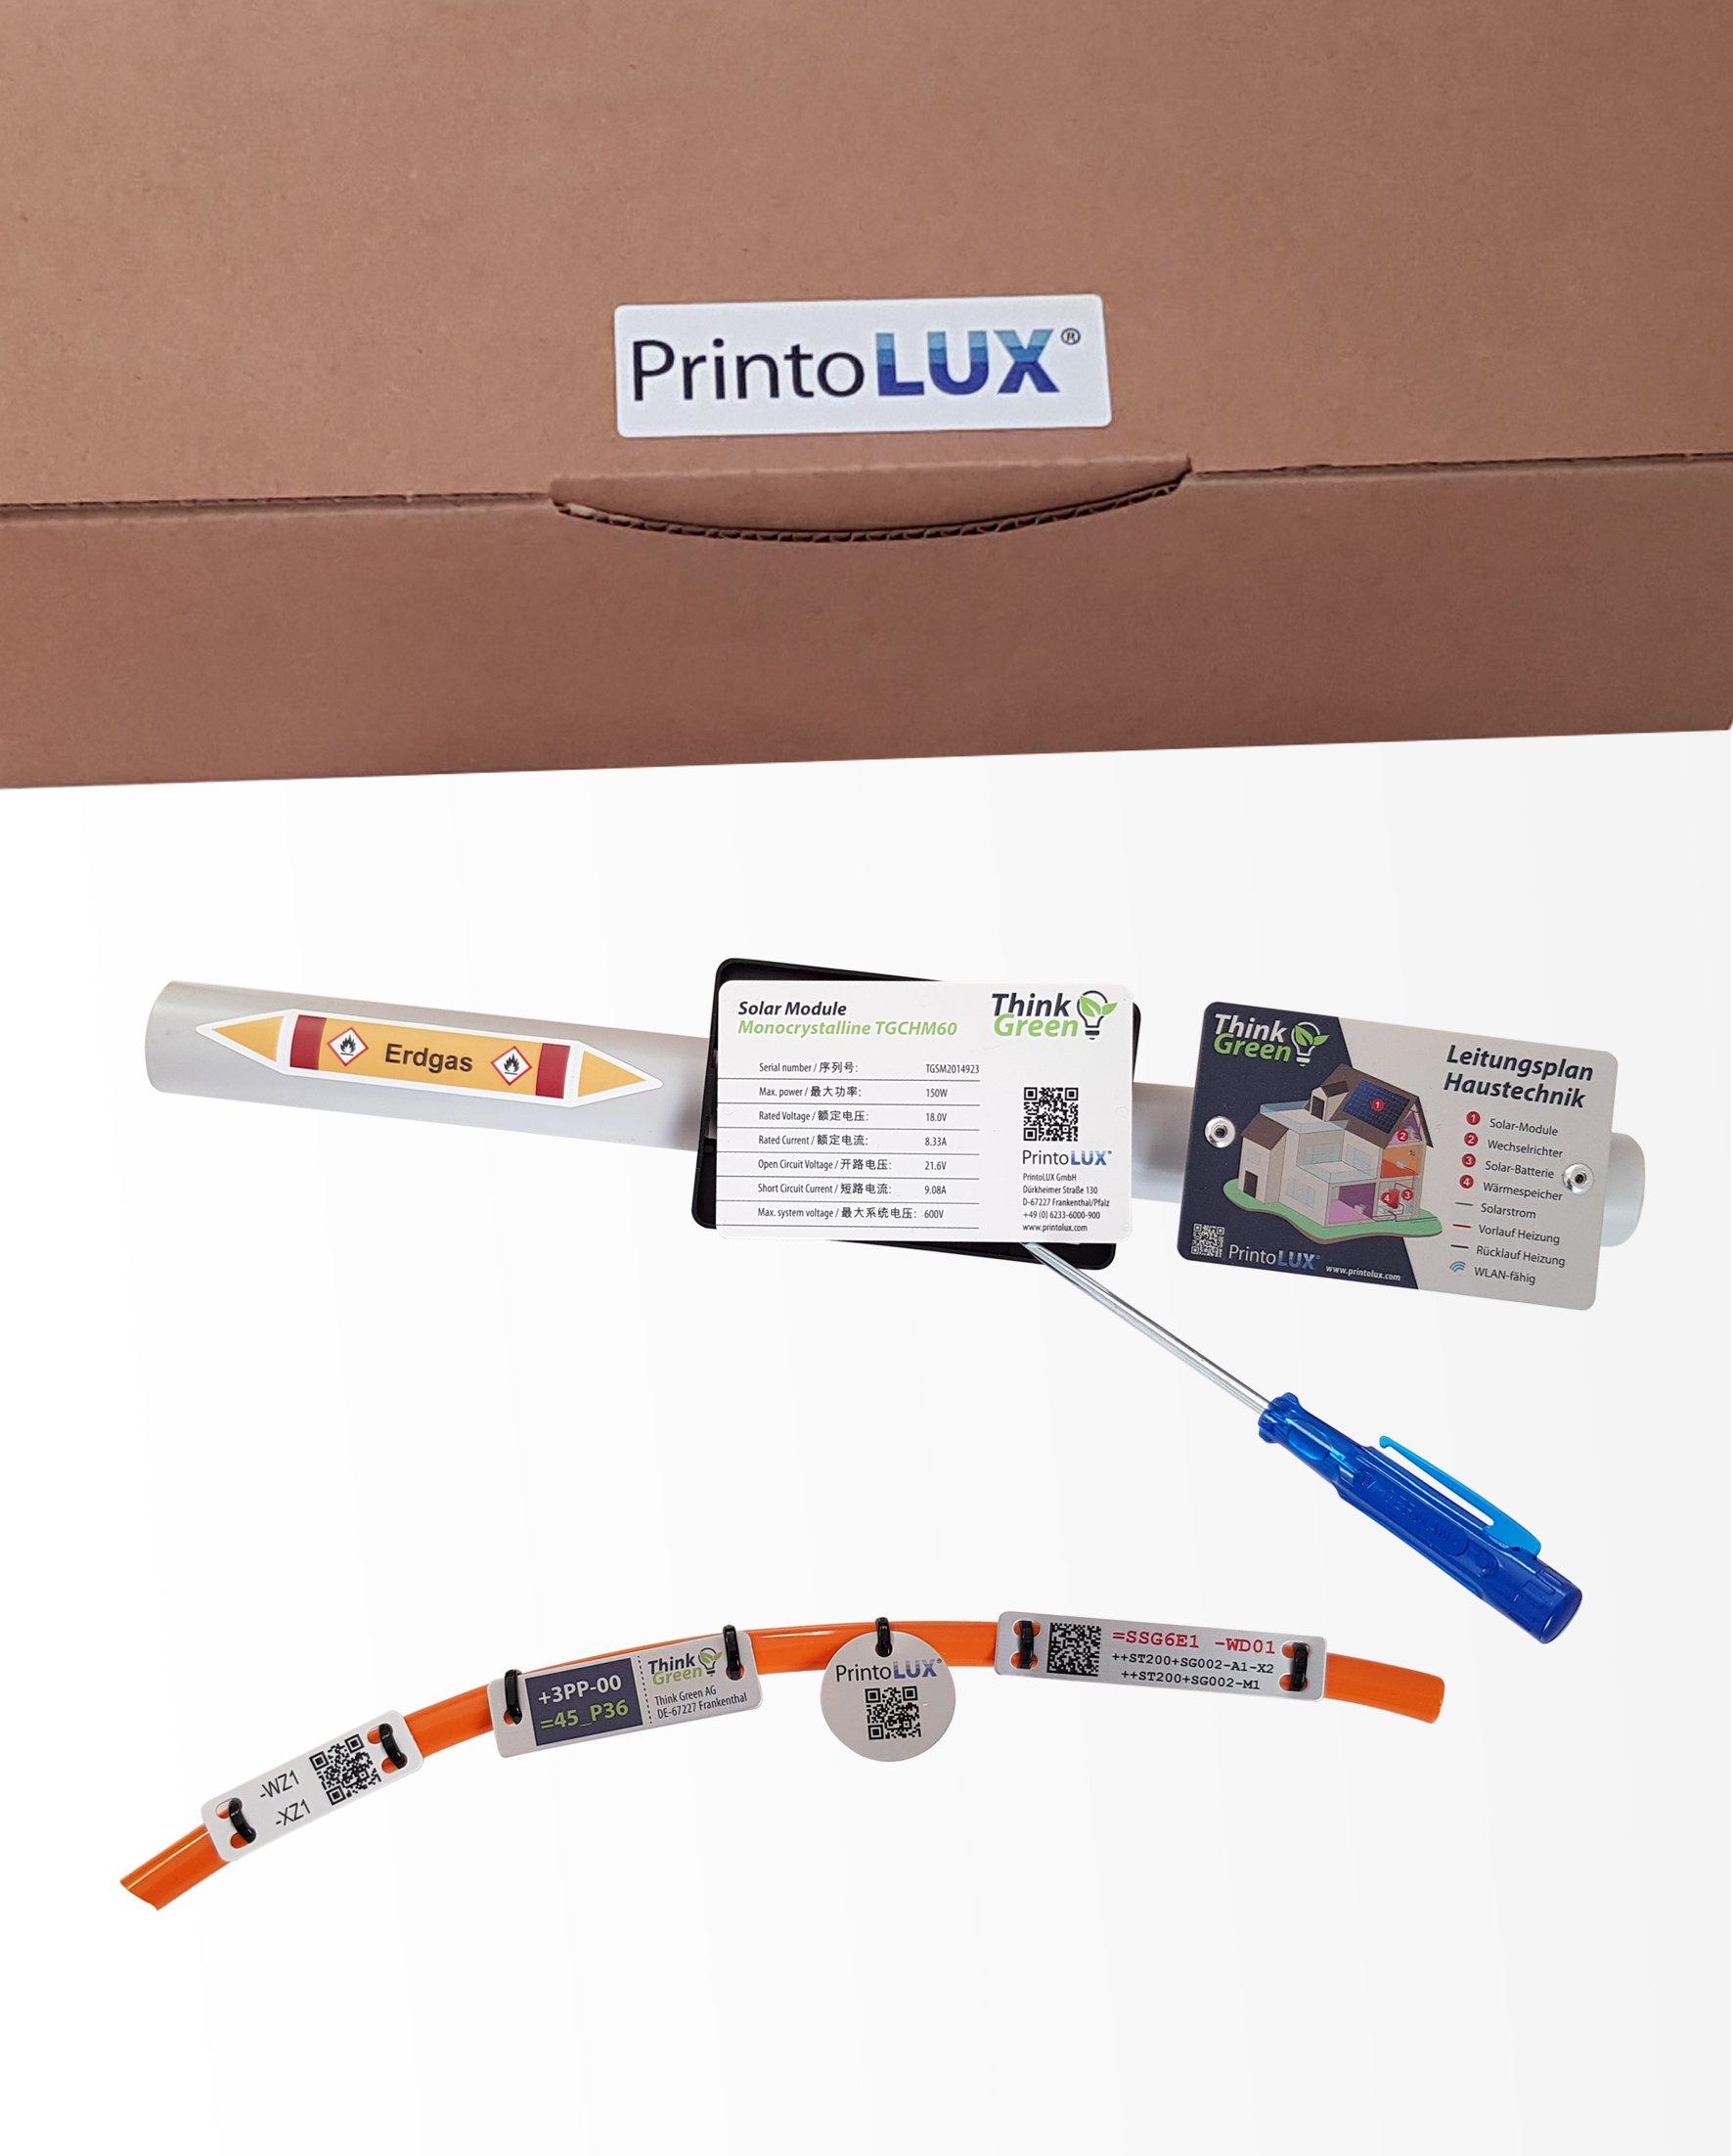 printolux-sample-box